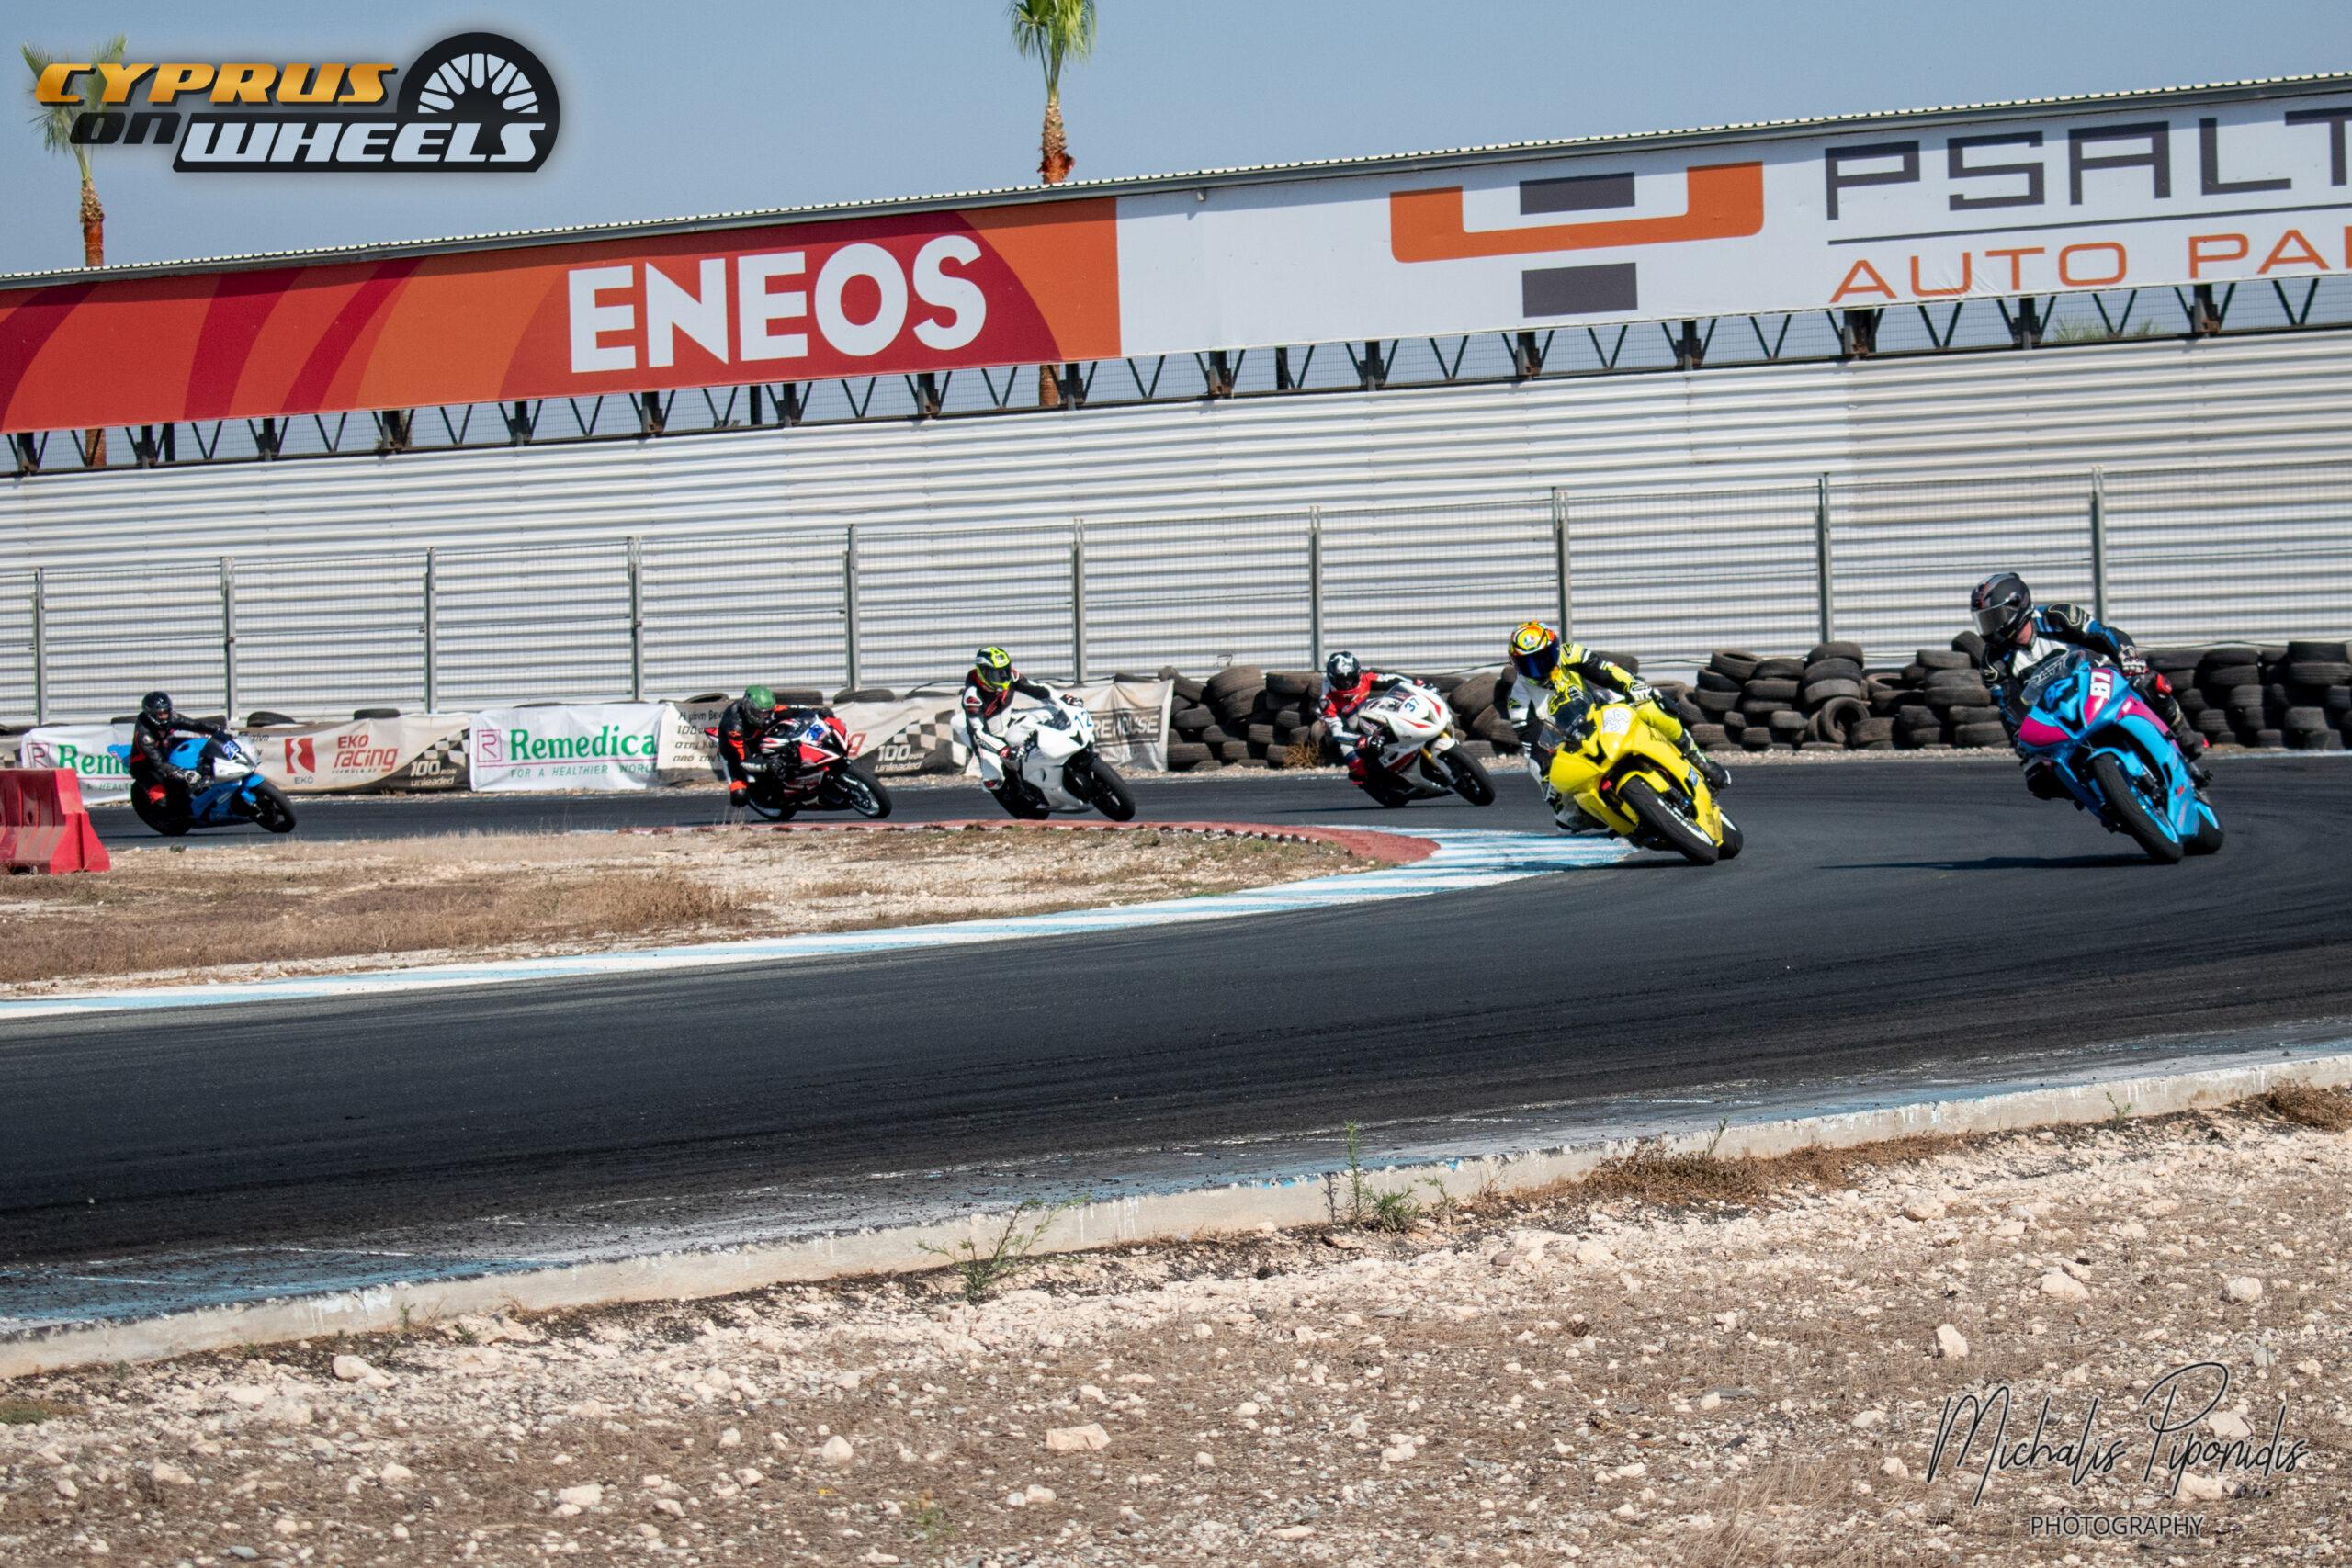 Achna speedway motorcycle racing